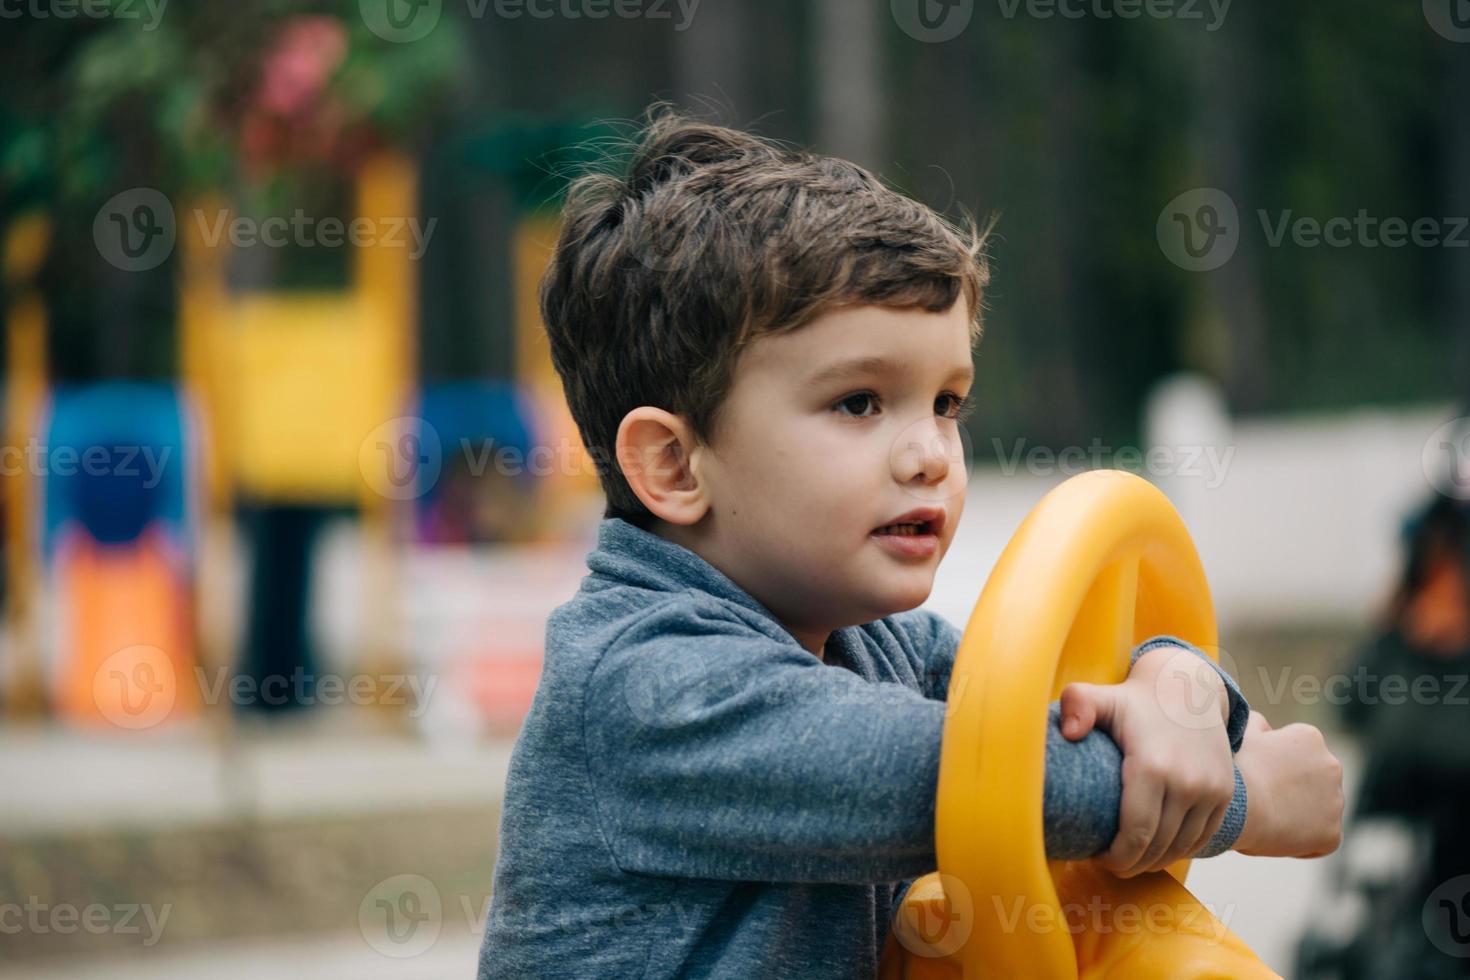 Cute boy portrait photo